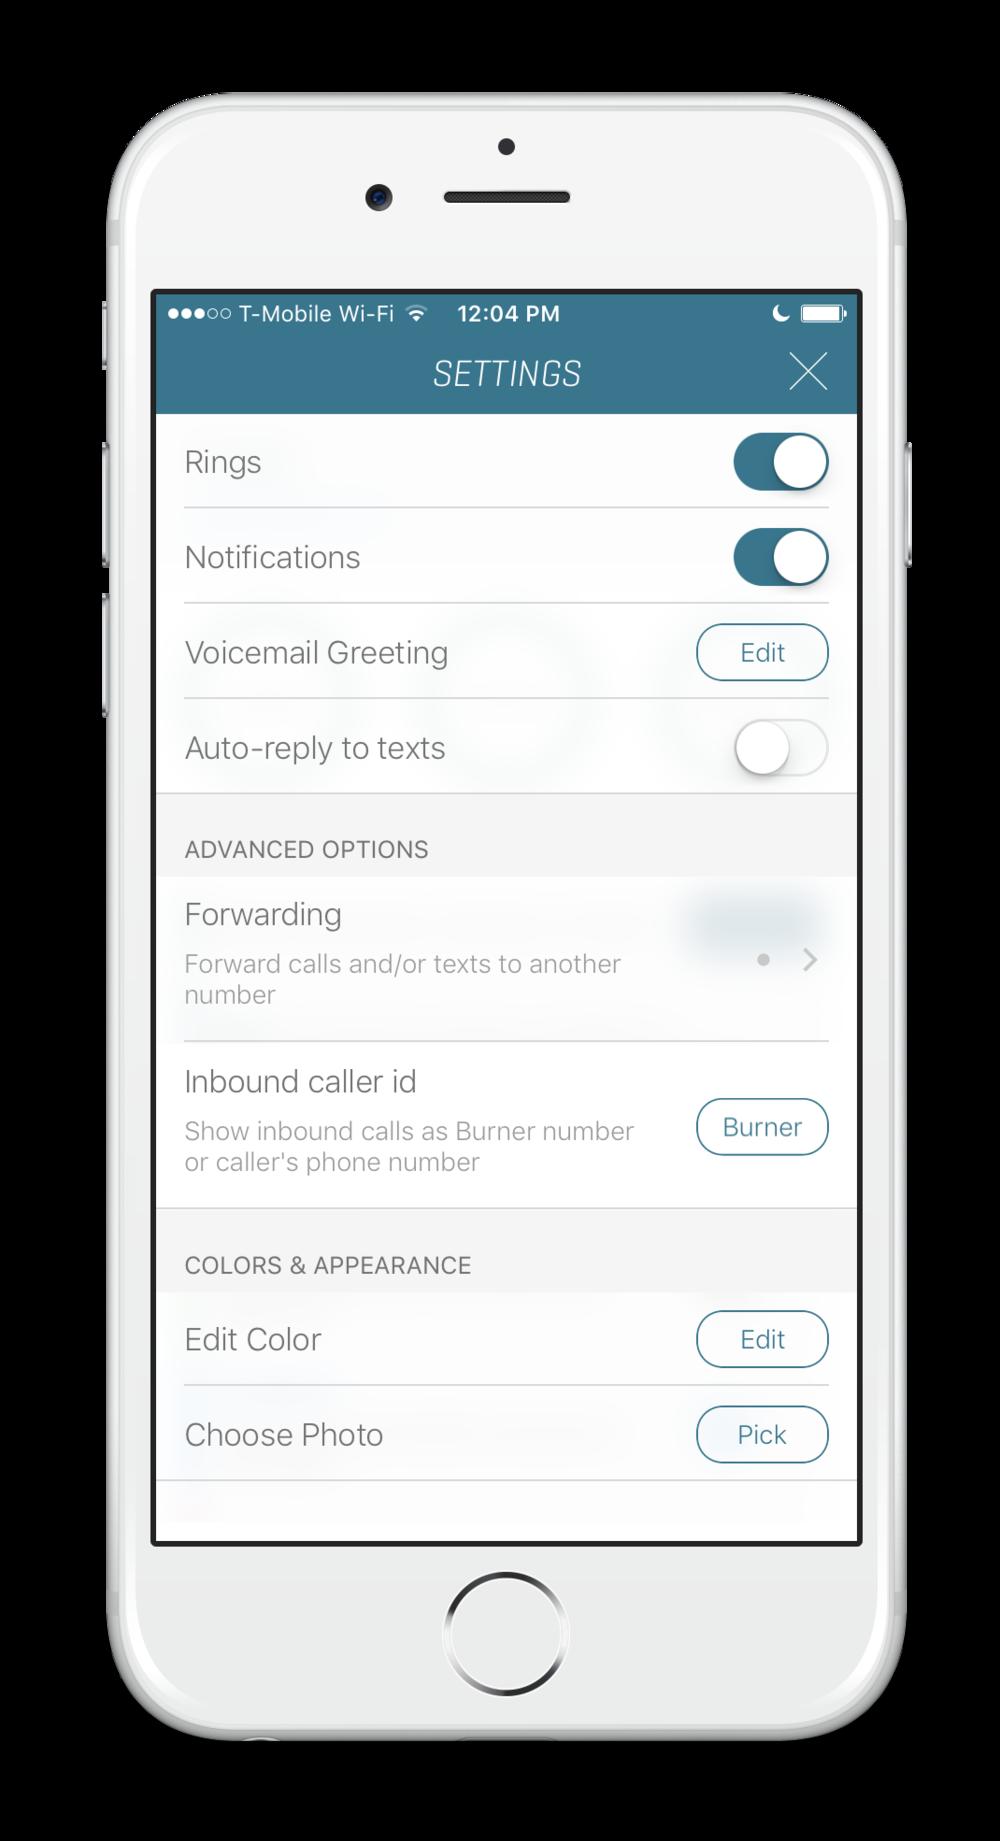 iPhone-6_screenshot_settings